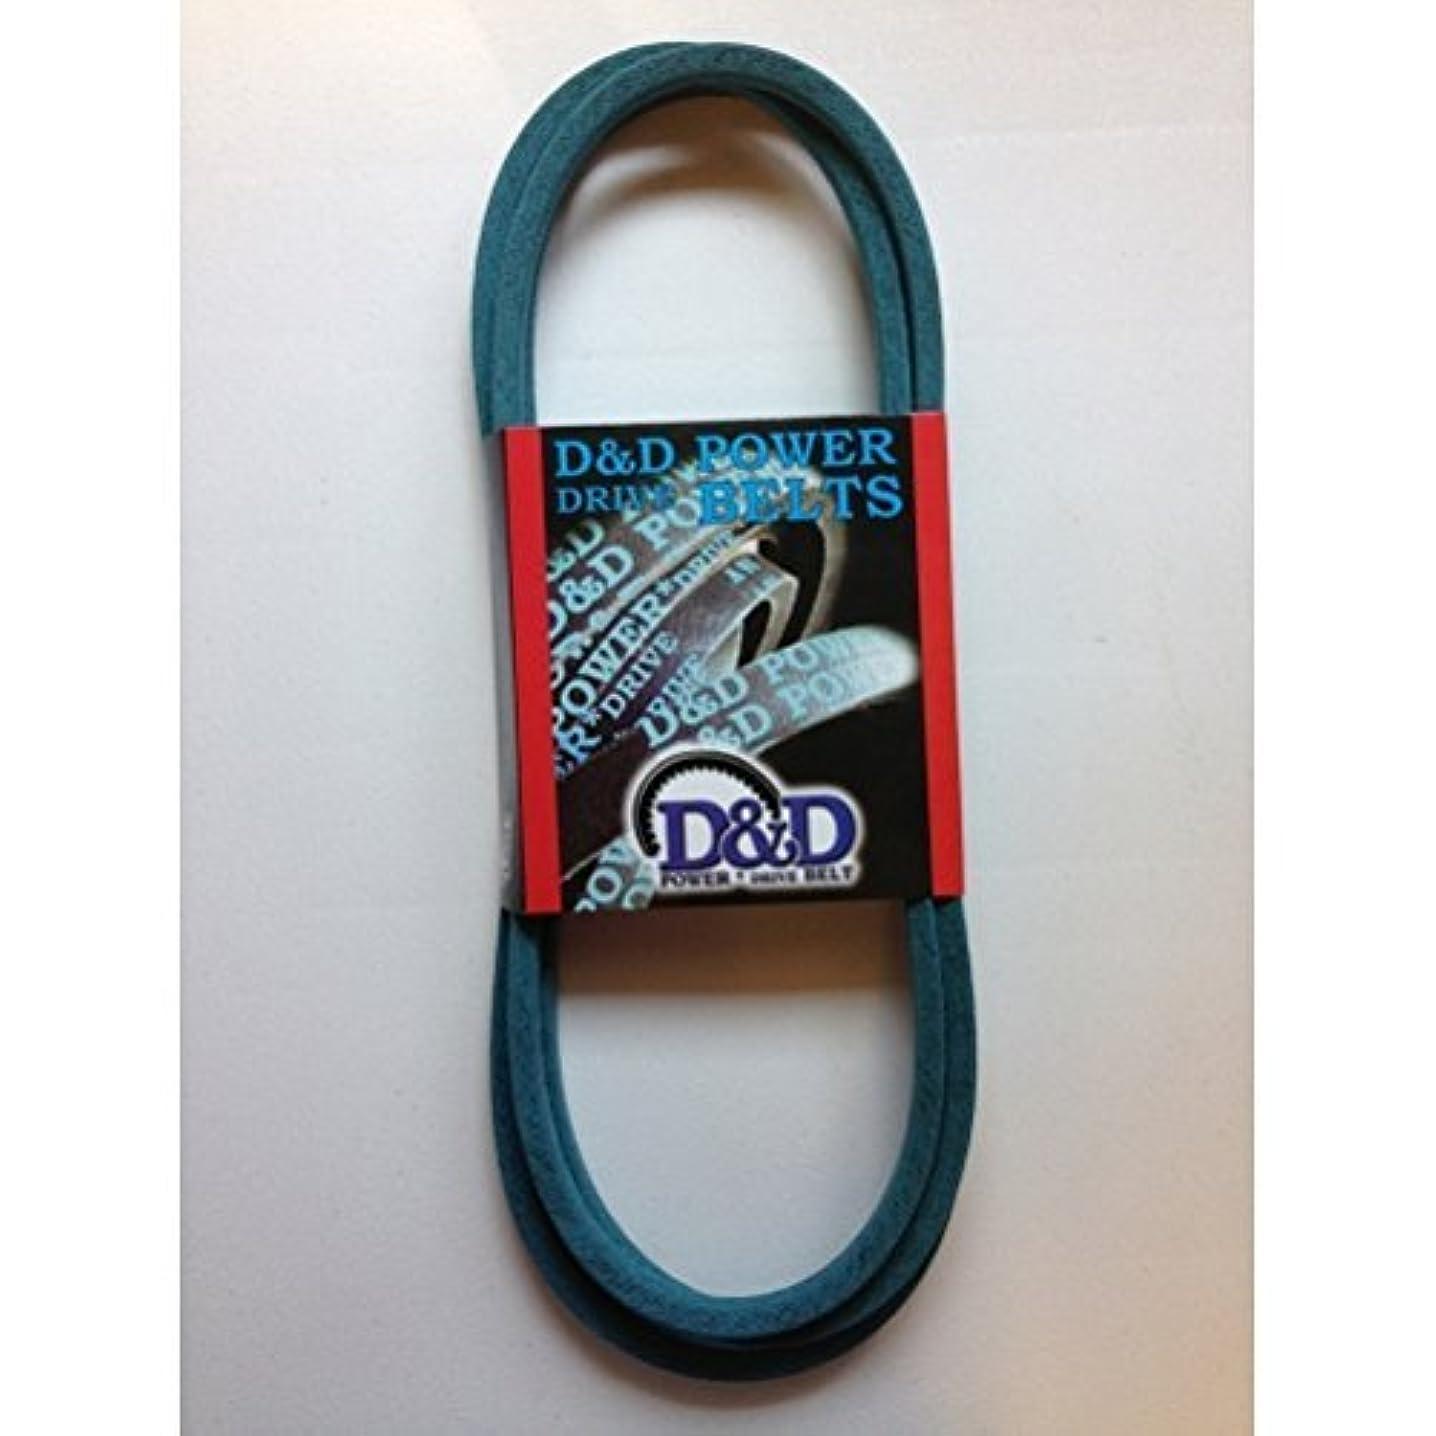 D&D PowerDrive 107-1735 Toro or Wheel Horse Kevlar Replacement Belt, Aramid, 132